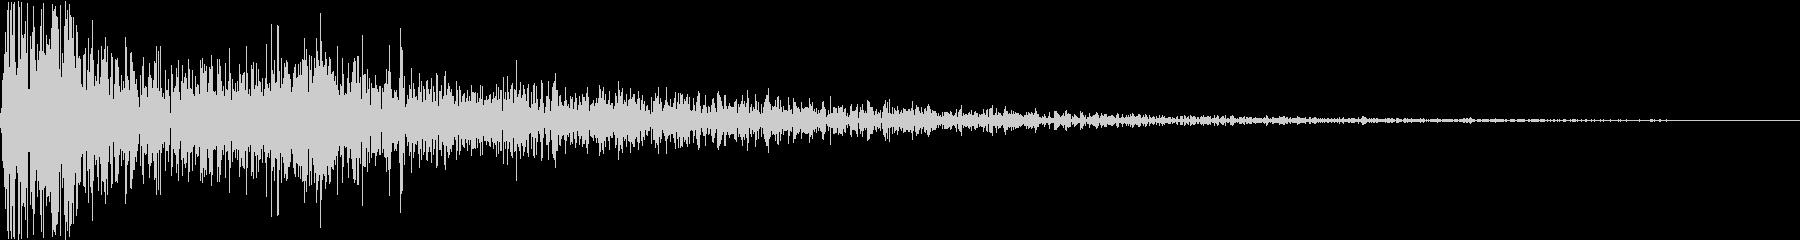 DTM Snare 9 オリジナル音源の未再生の波形